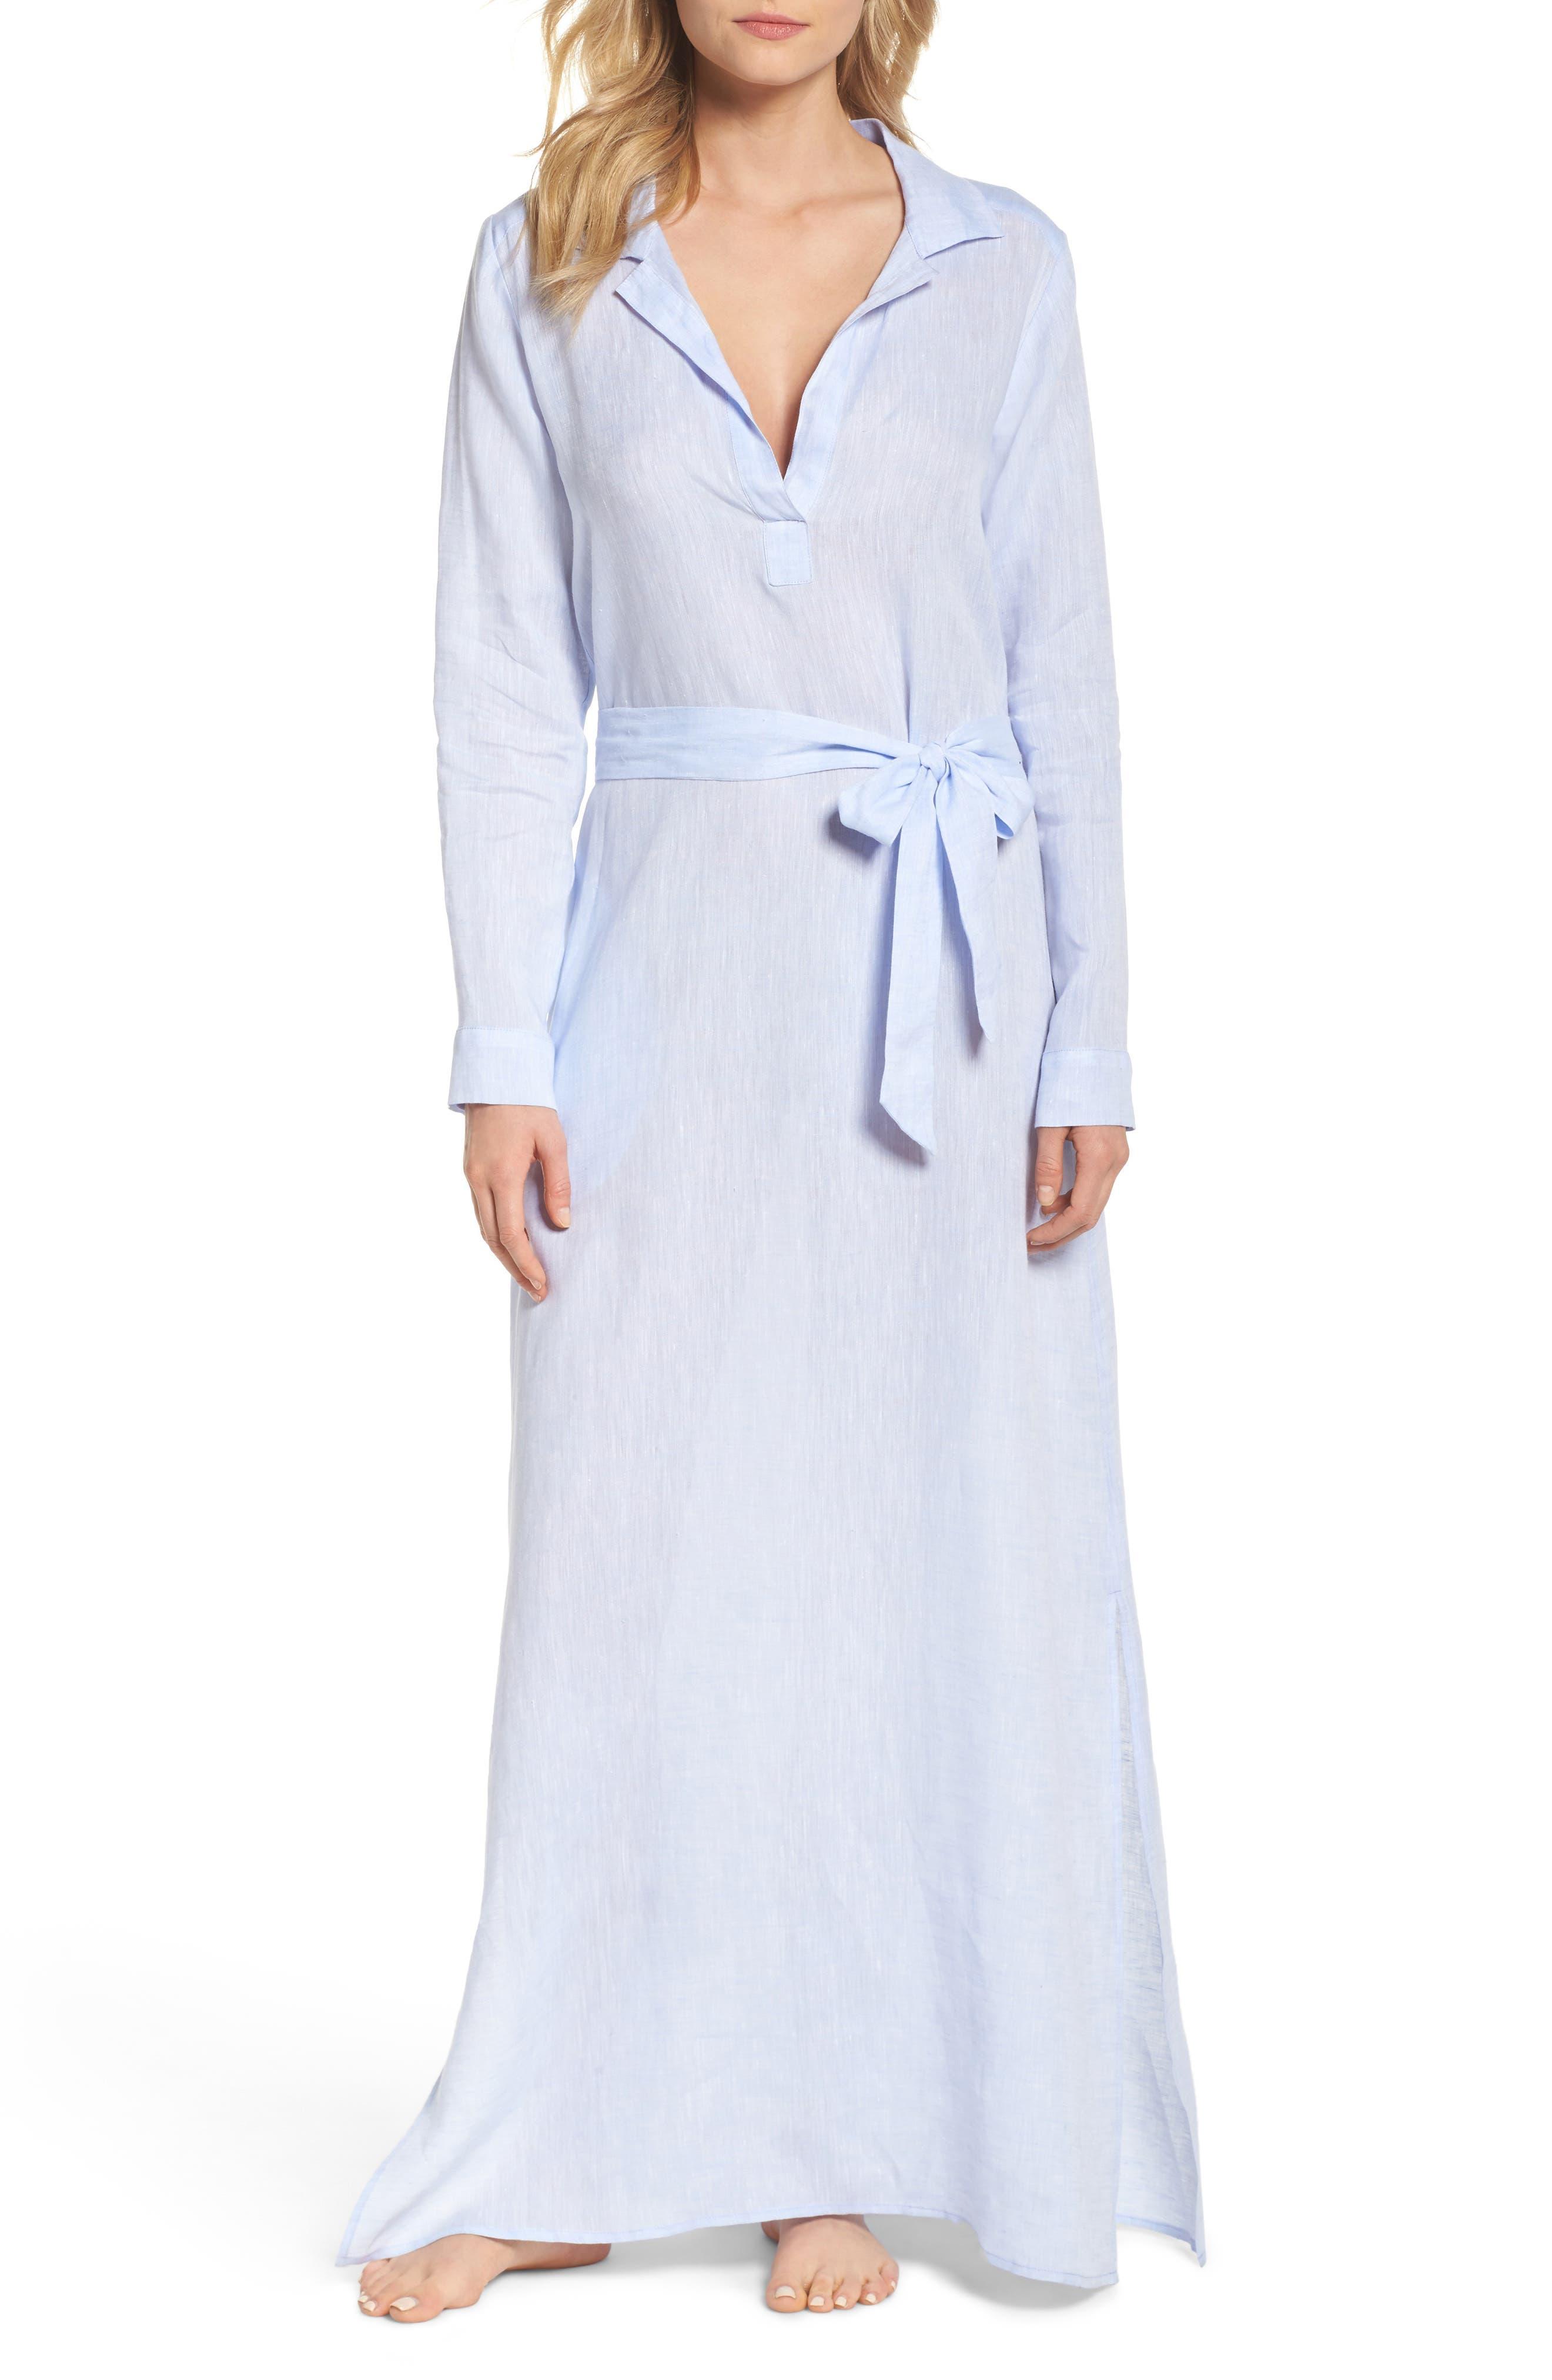 Main Image - Pour Les Femmes Linen Maxi Sleep Shirtdress